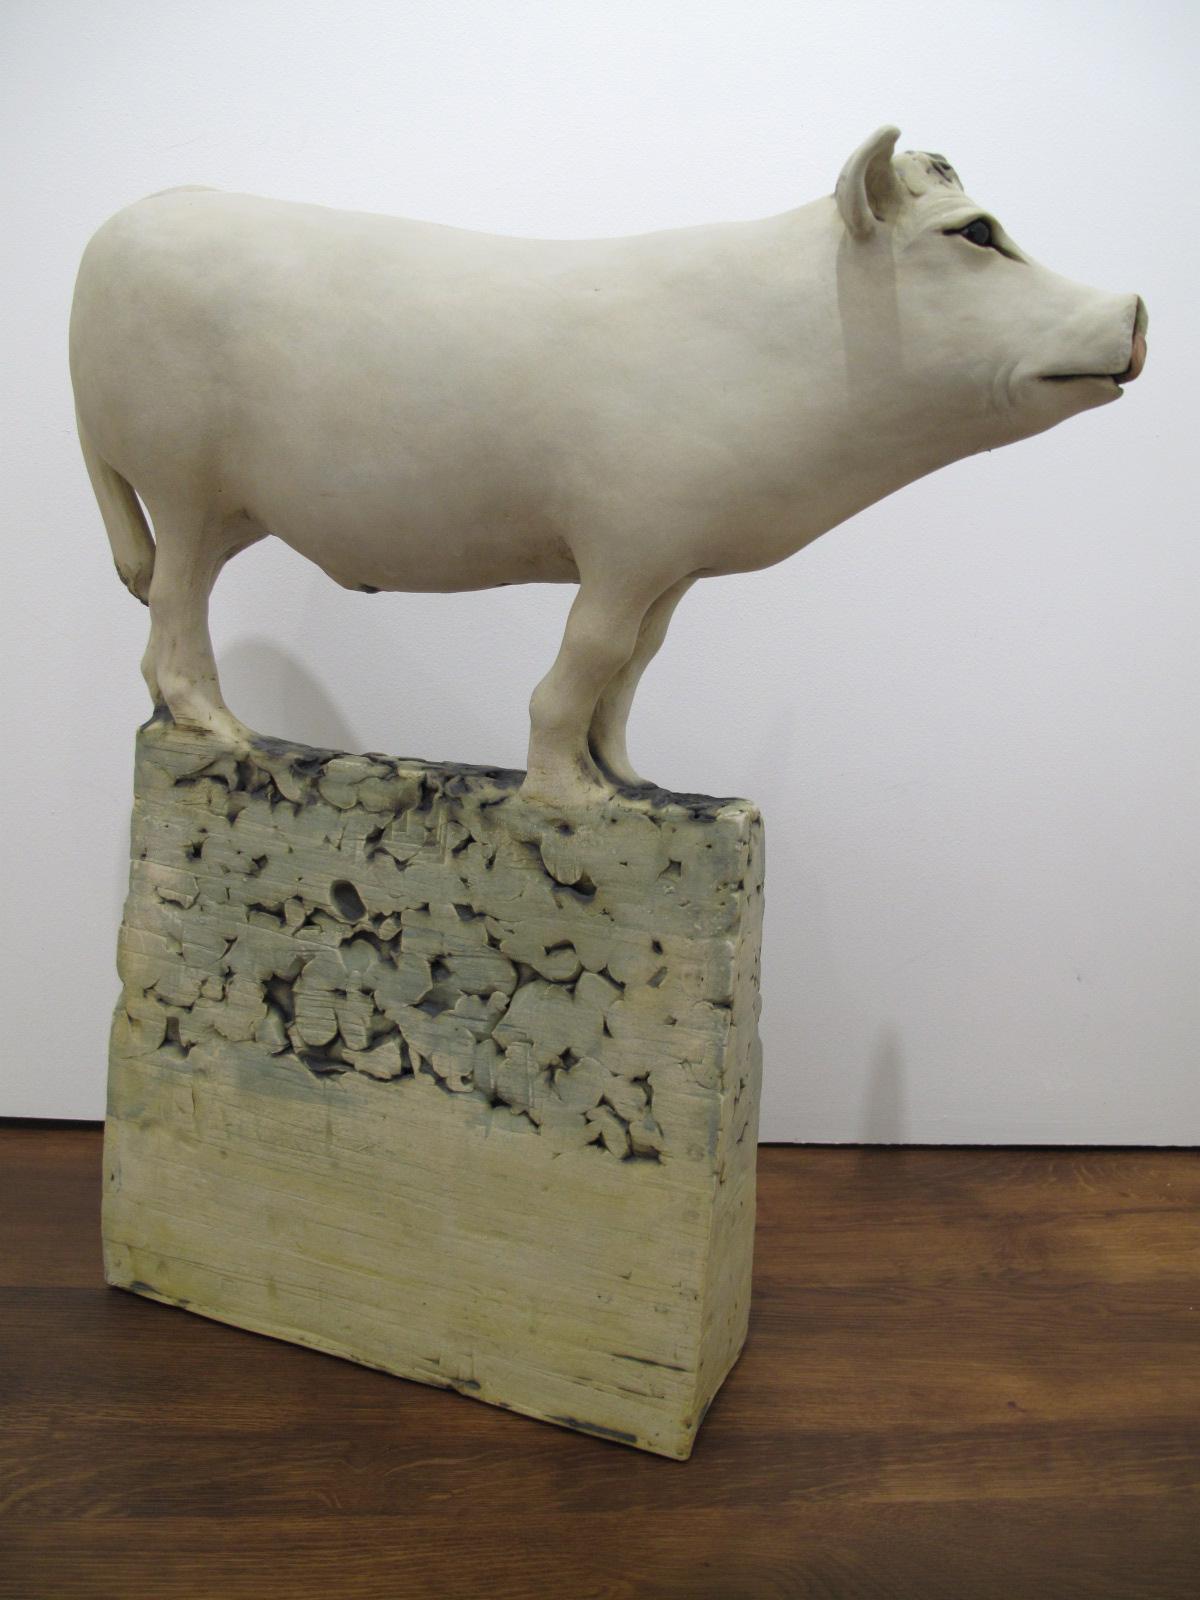 Ava the Cow